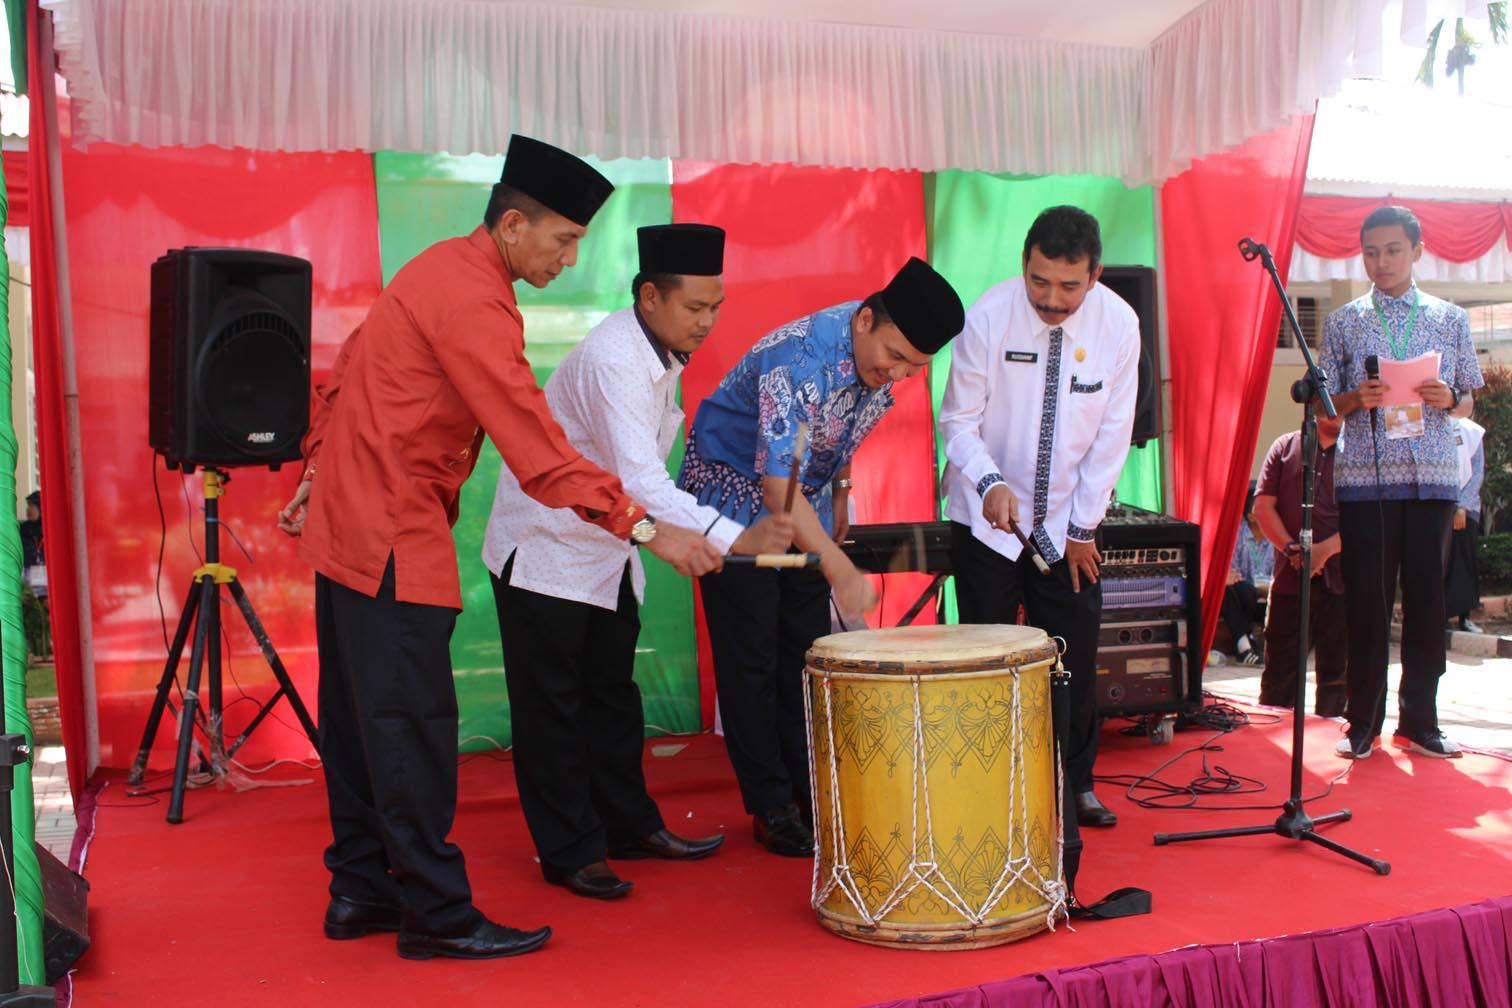 SMAN 1 Ampek Angkek adakan Lomba English Competetion dan Pra Oliempiade tingkat Se Sumatera Barat